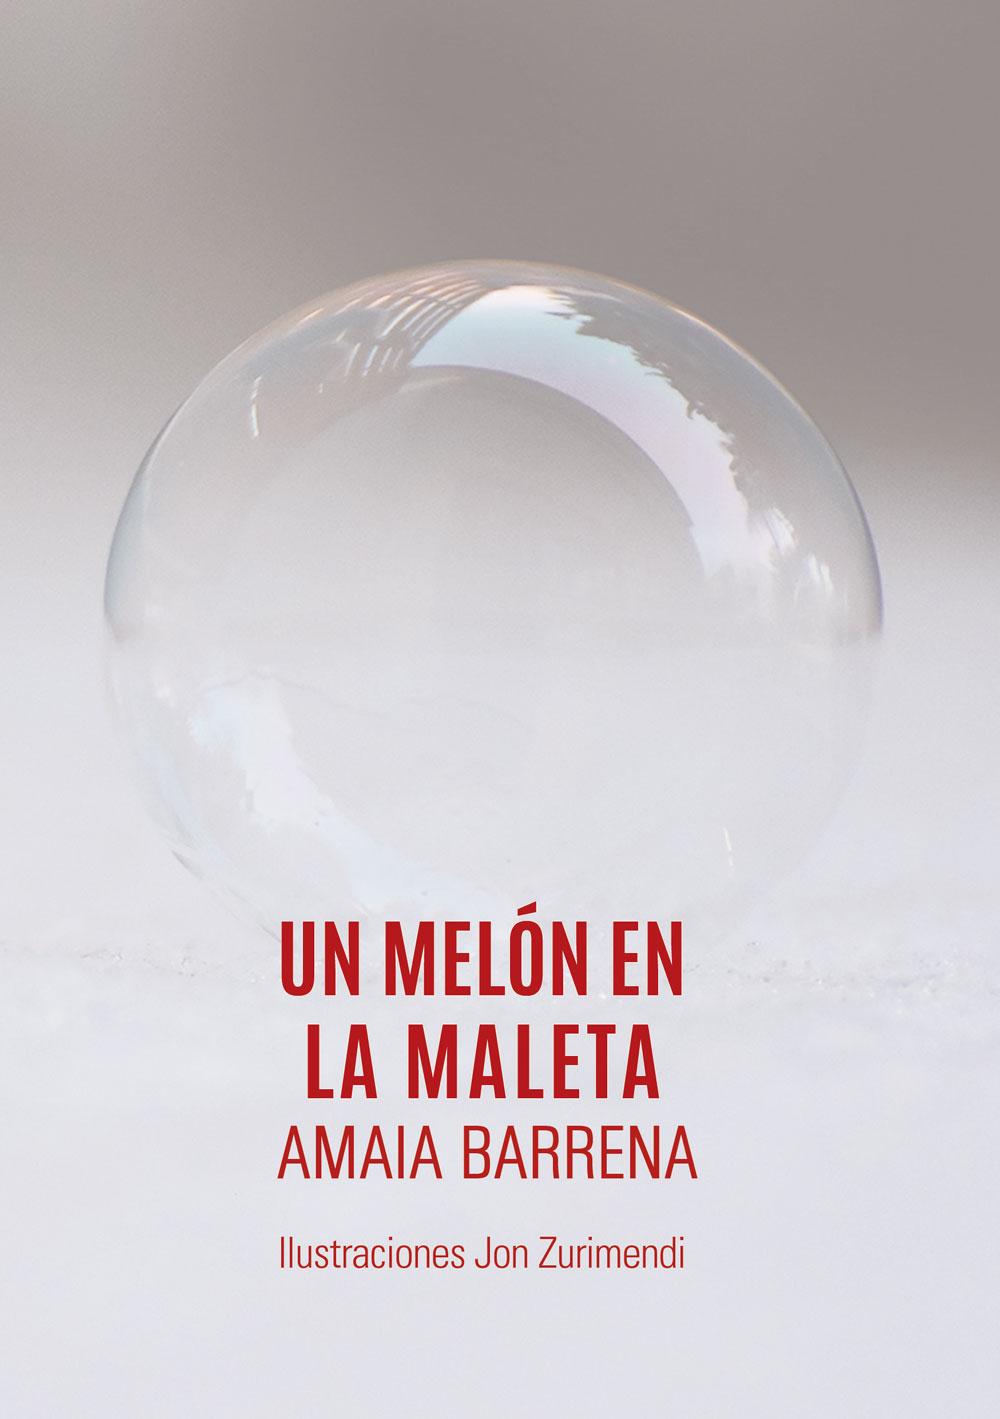 Un melón en la maleta, Amaia Barrena, A Fortiori Editorial